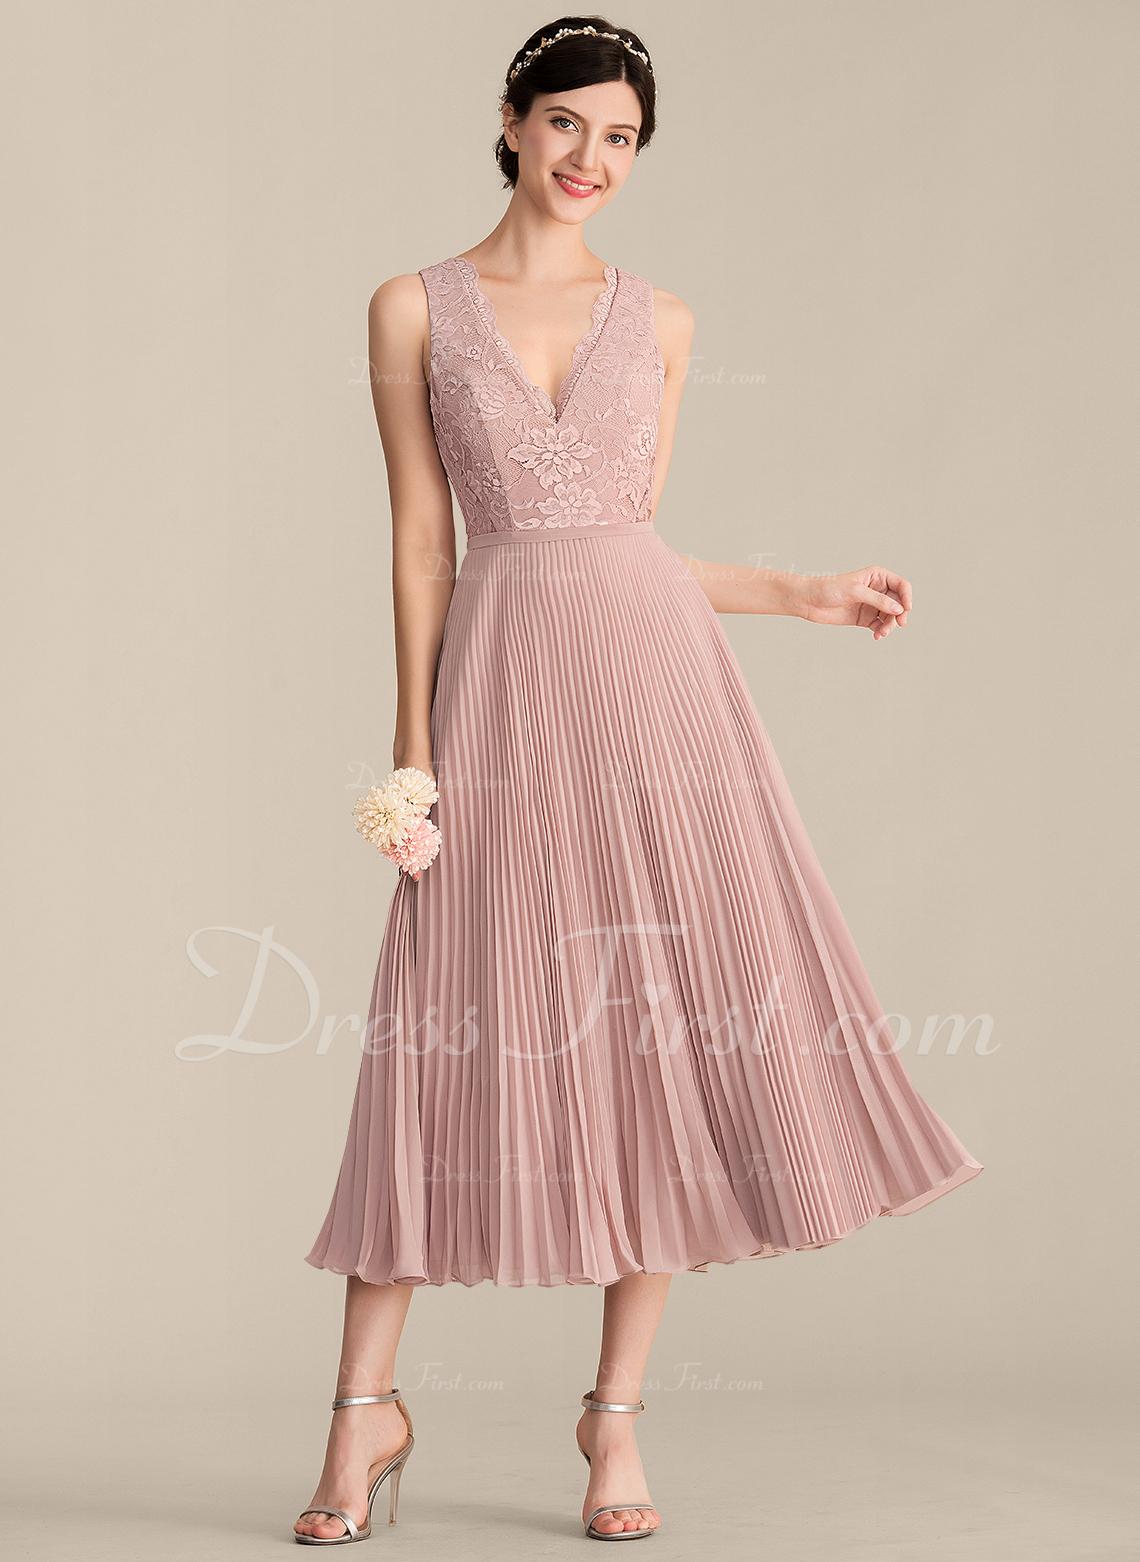 A-Line/Princess V-neck Tea-Length Chiffon Lace Bridesmaid Dress With Pleated